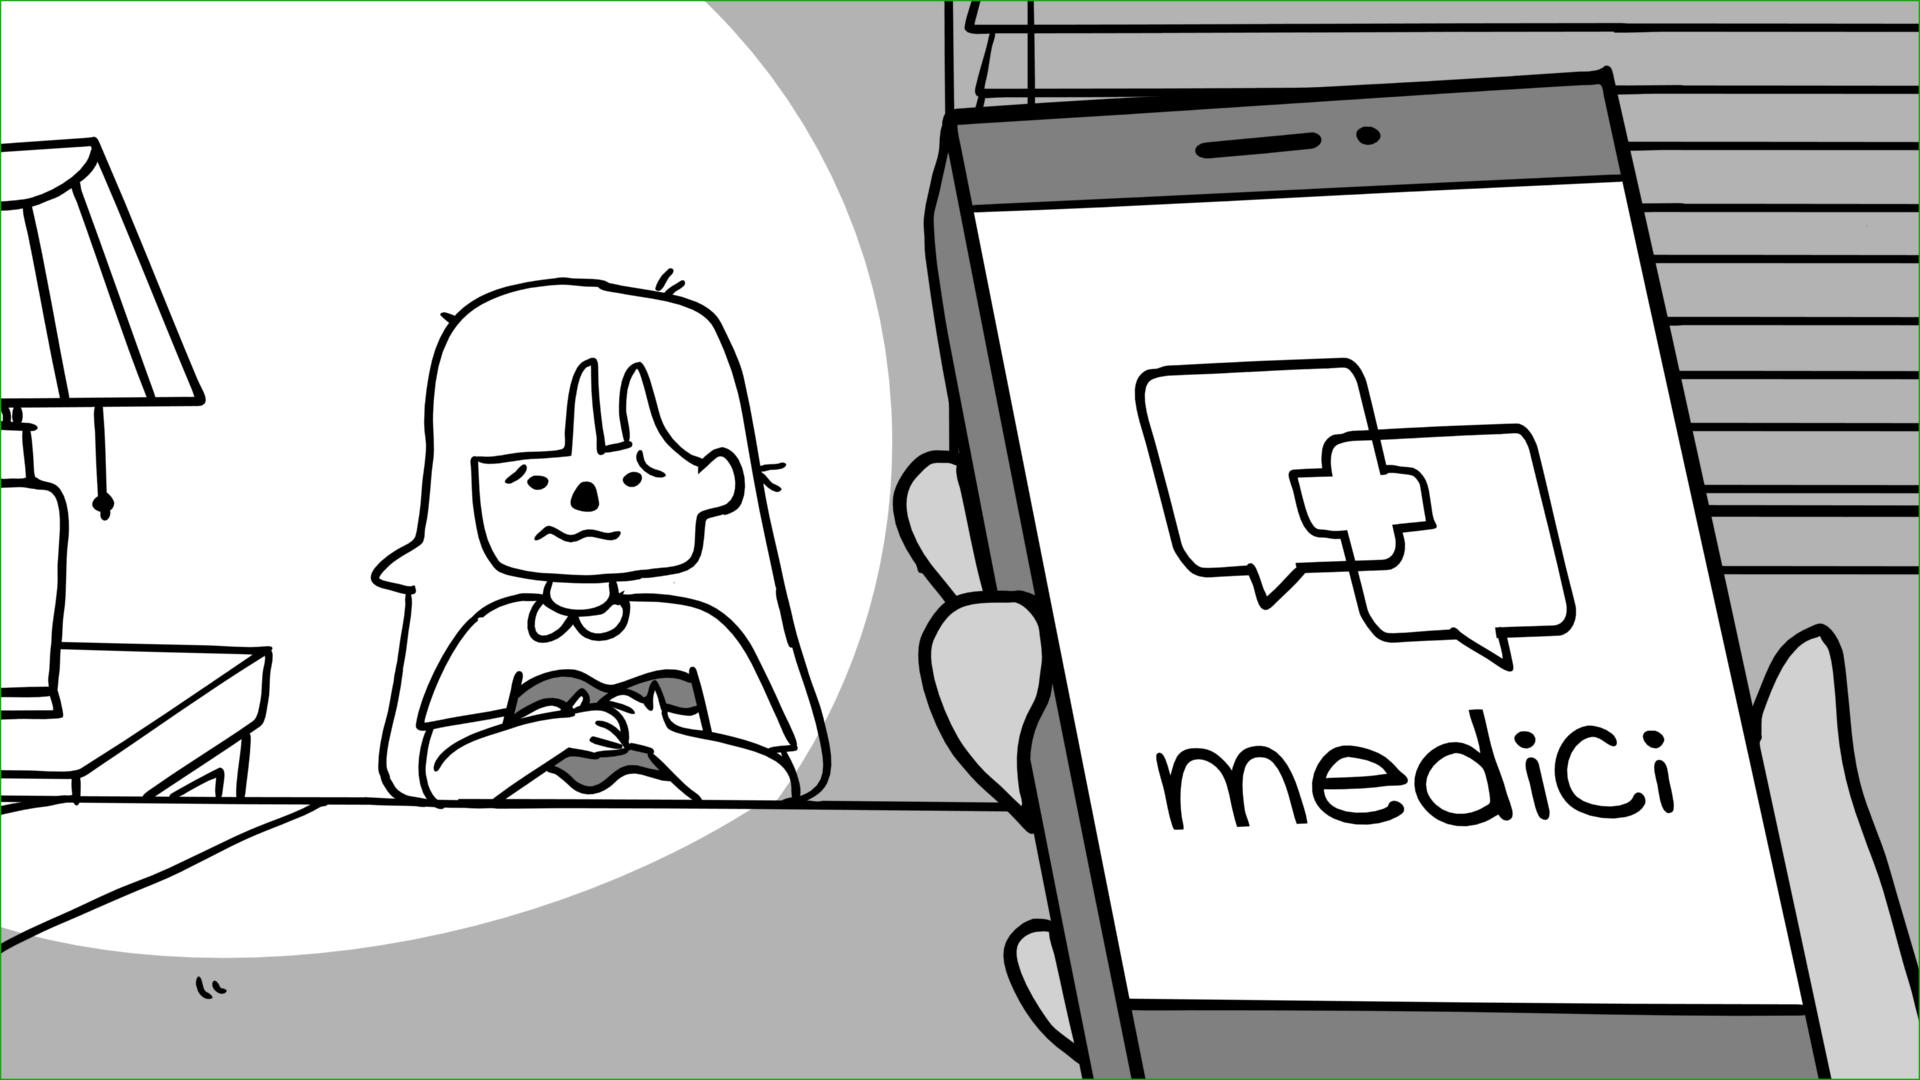 Medici_Storyboards_01-000000001-30.jpg